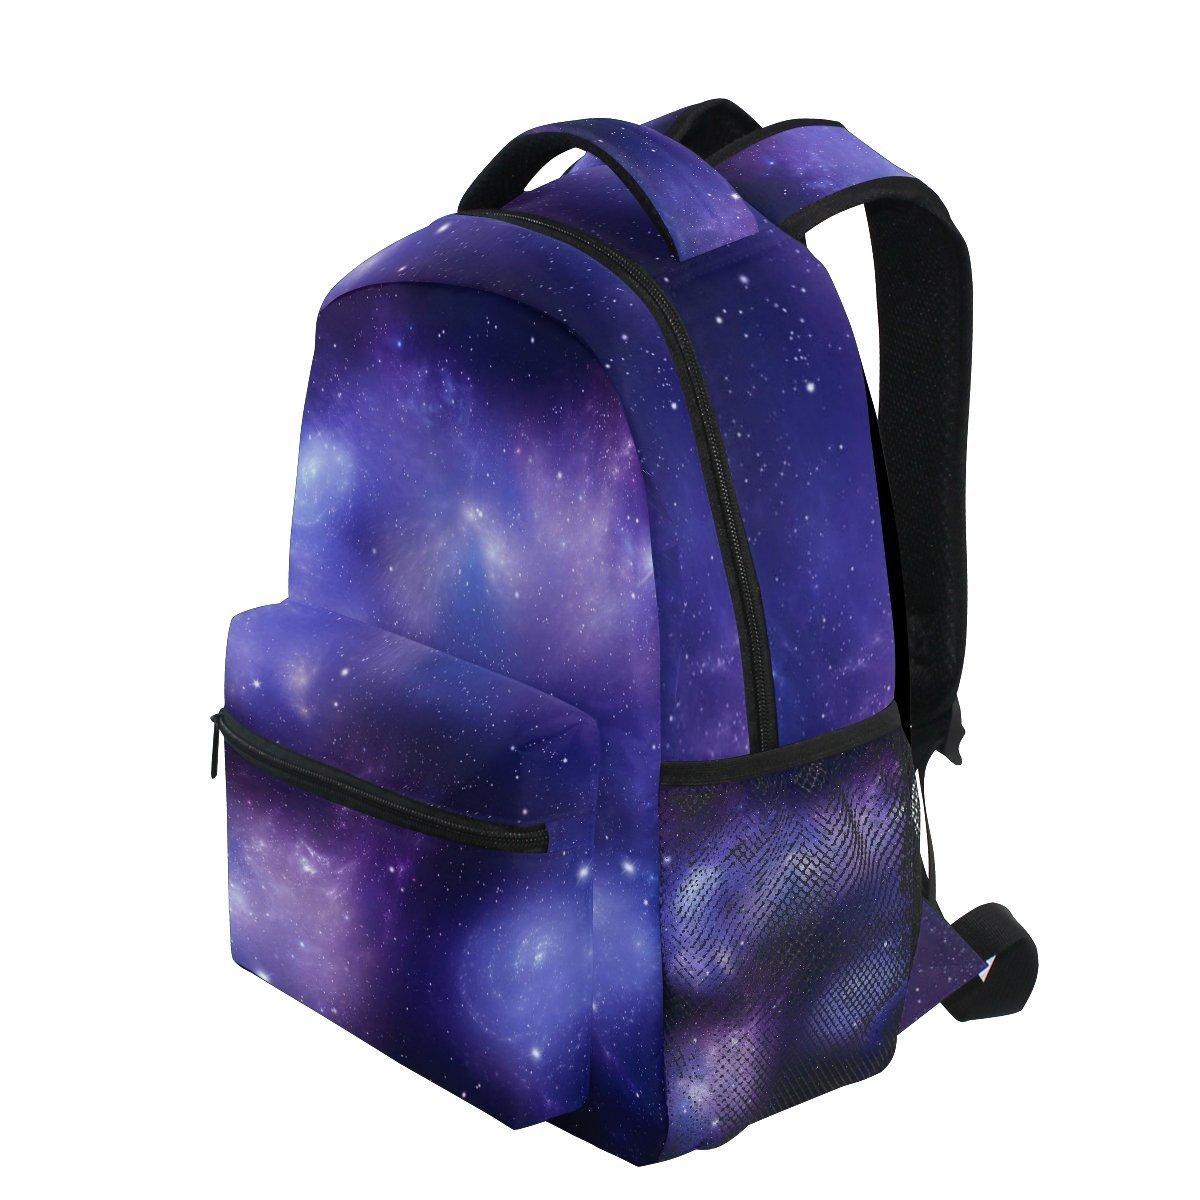 AHOMY ガールズ スクールバックパック ギャラクシー 星 宇宙 大学 ブックバッグ レディ 旅行 リュックサック   B07G43XS4Y